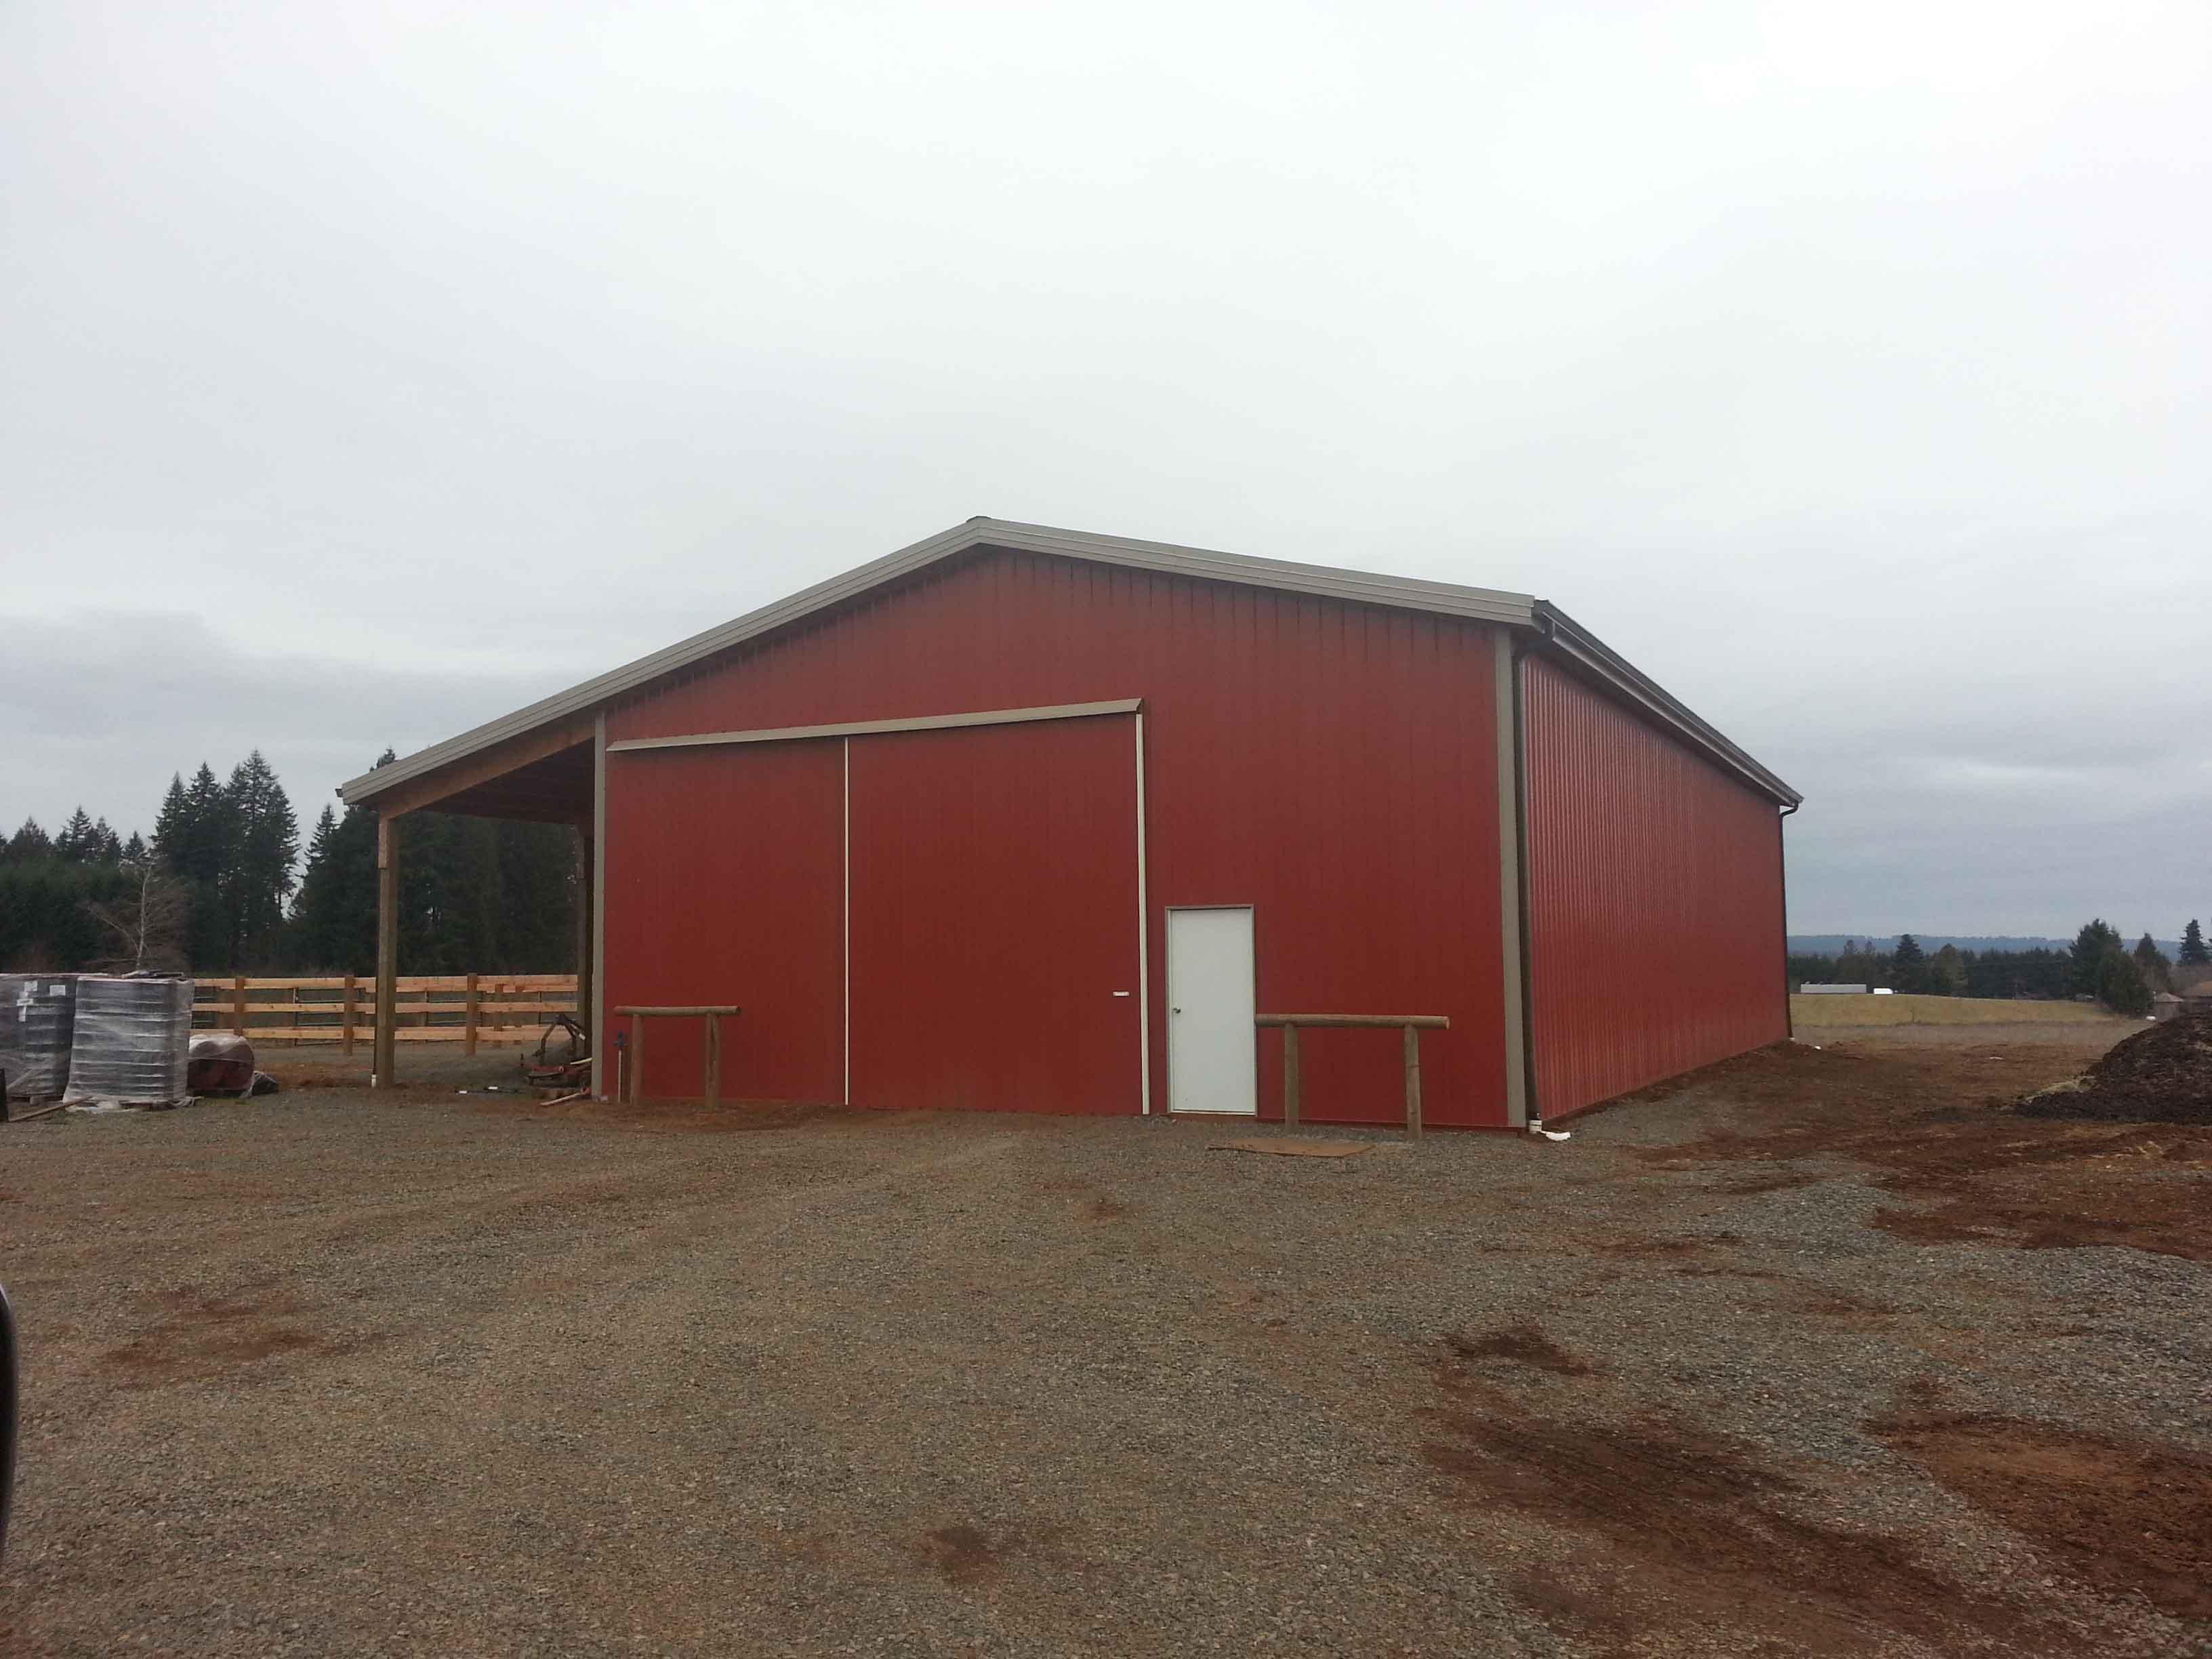 48'x72'x16' pole barn